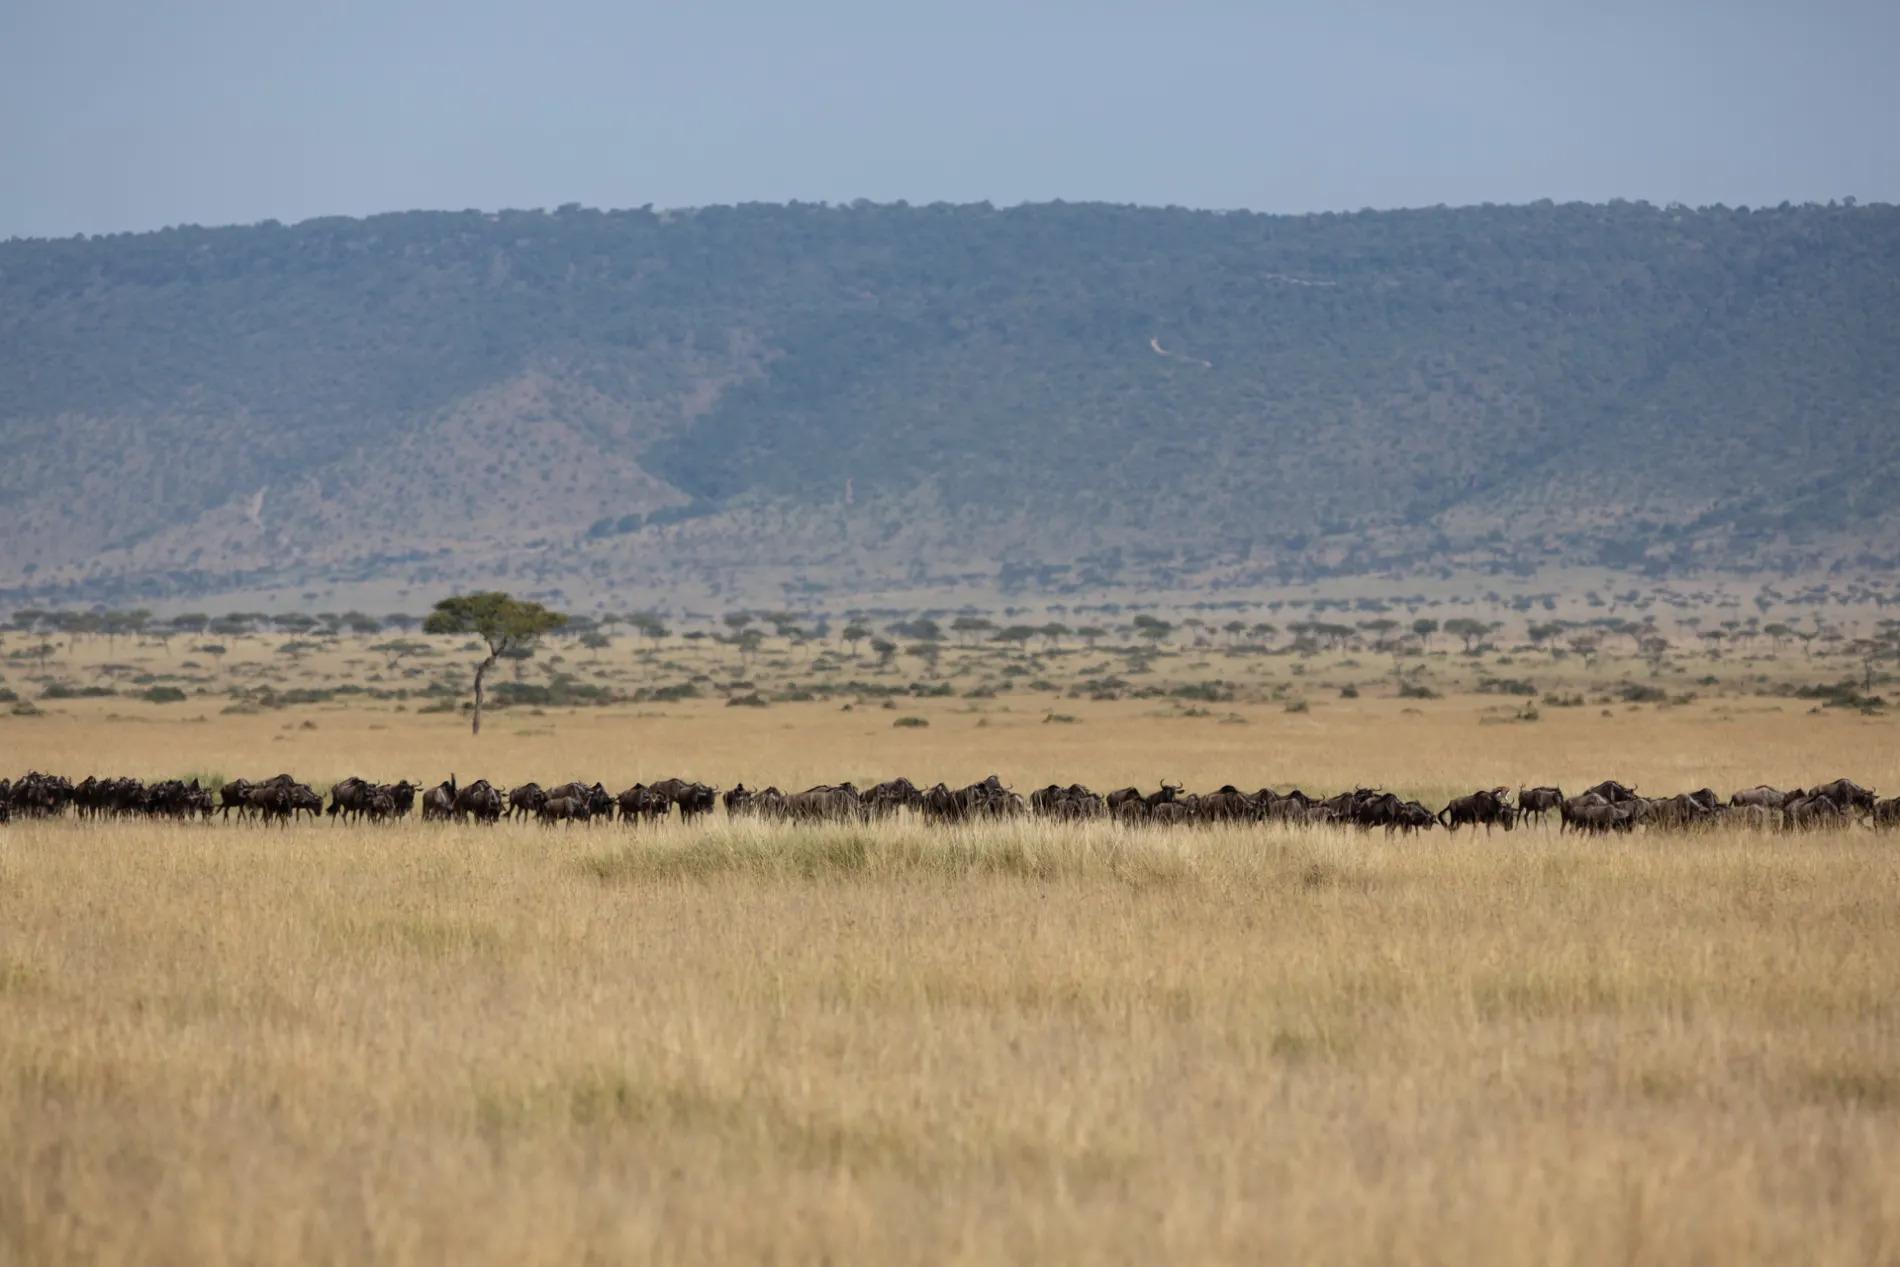 LIne of wildebeest